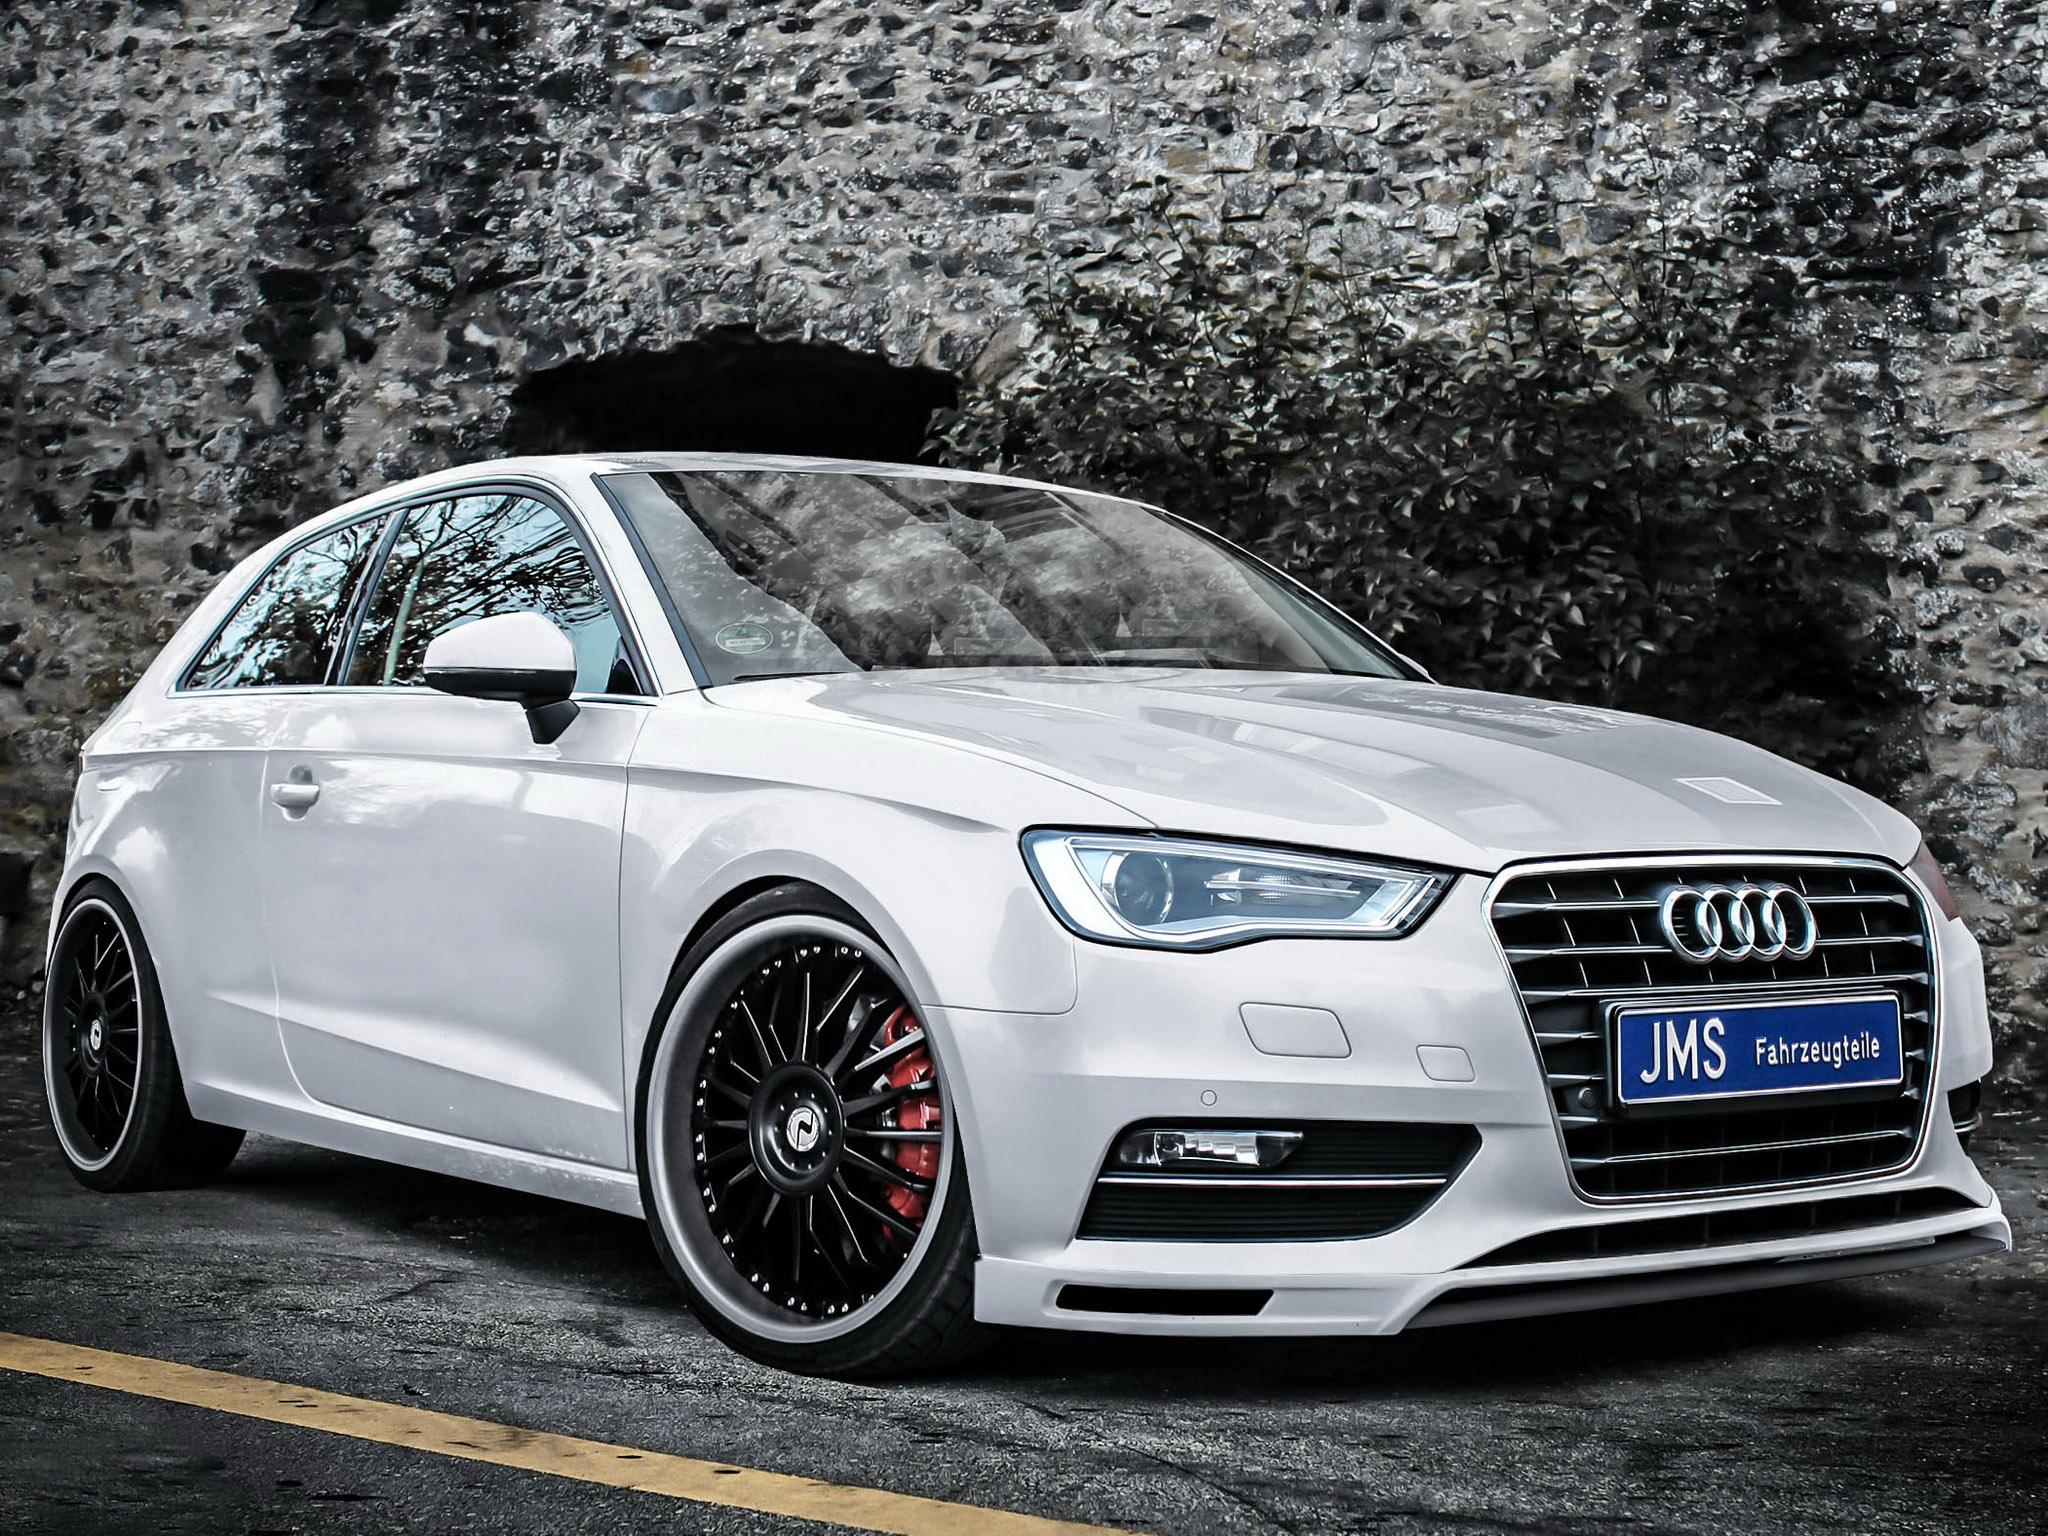 Audi S3 Wallpaper 2048x1536 Download Hd Wallpaper Wallpapertip